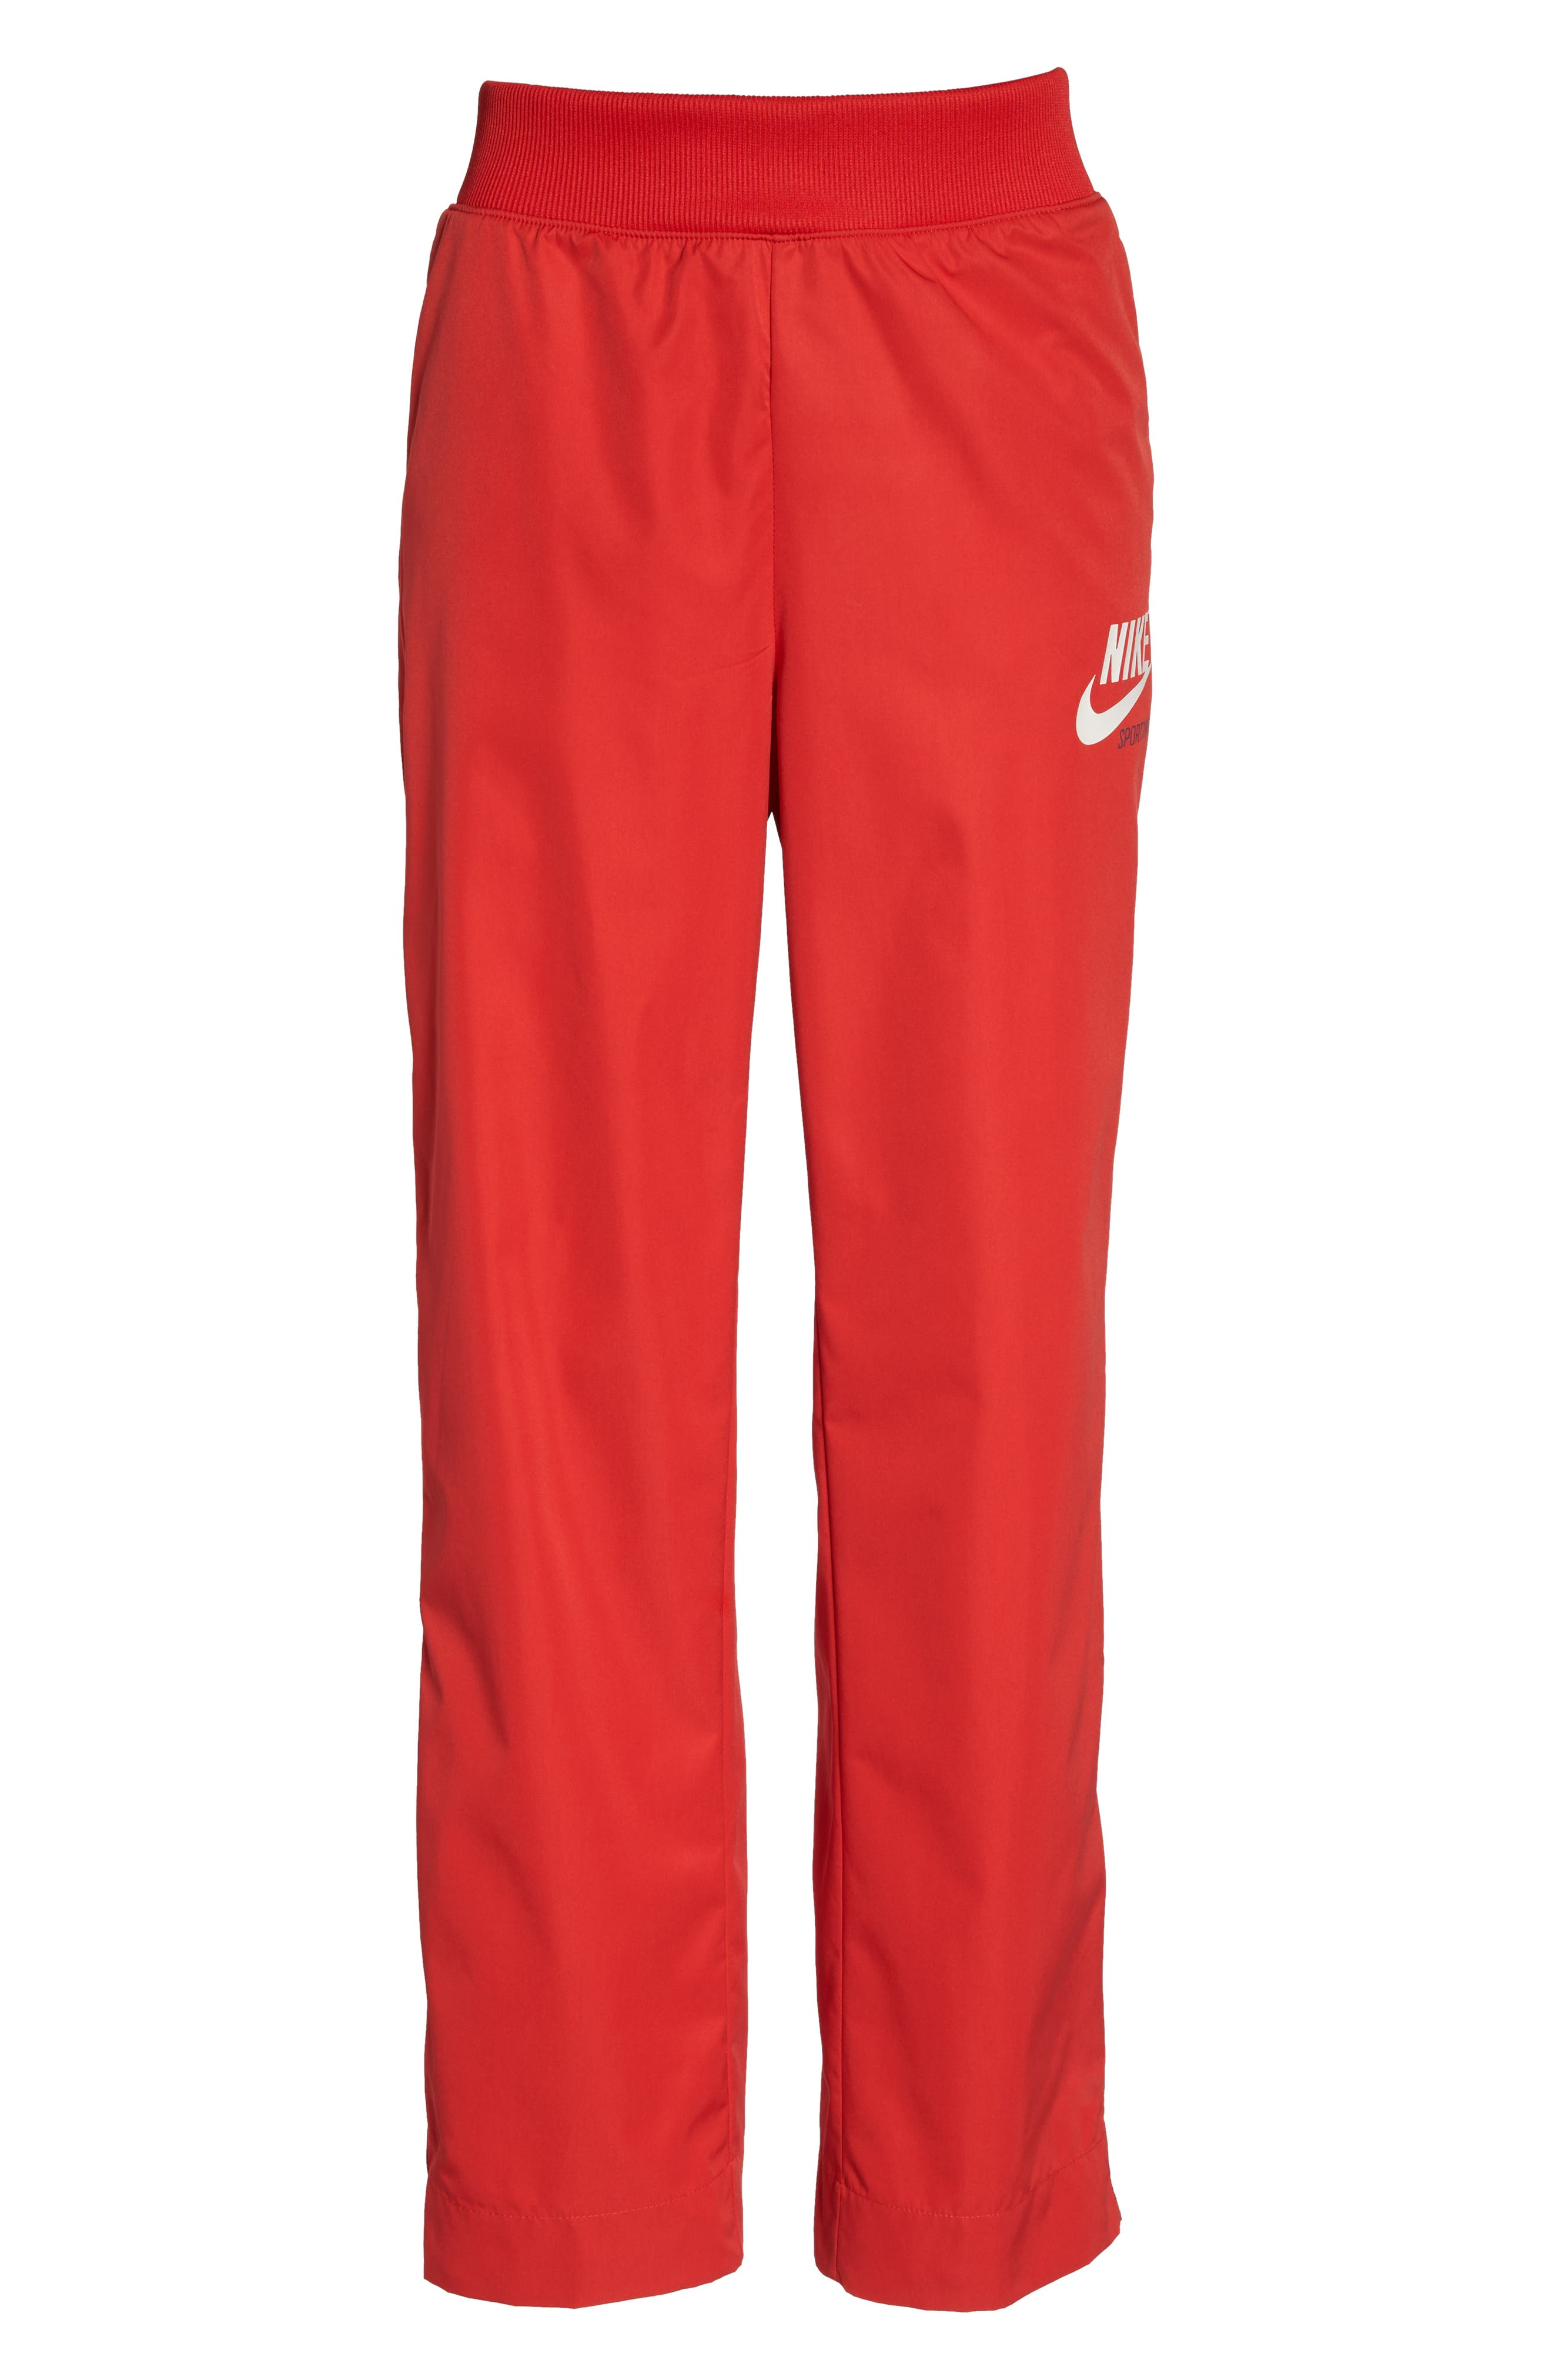 Sportswear Archive Snap Track Pants,                             Alternate thumbnail 4, color,                             University Red/ Thunder Blue